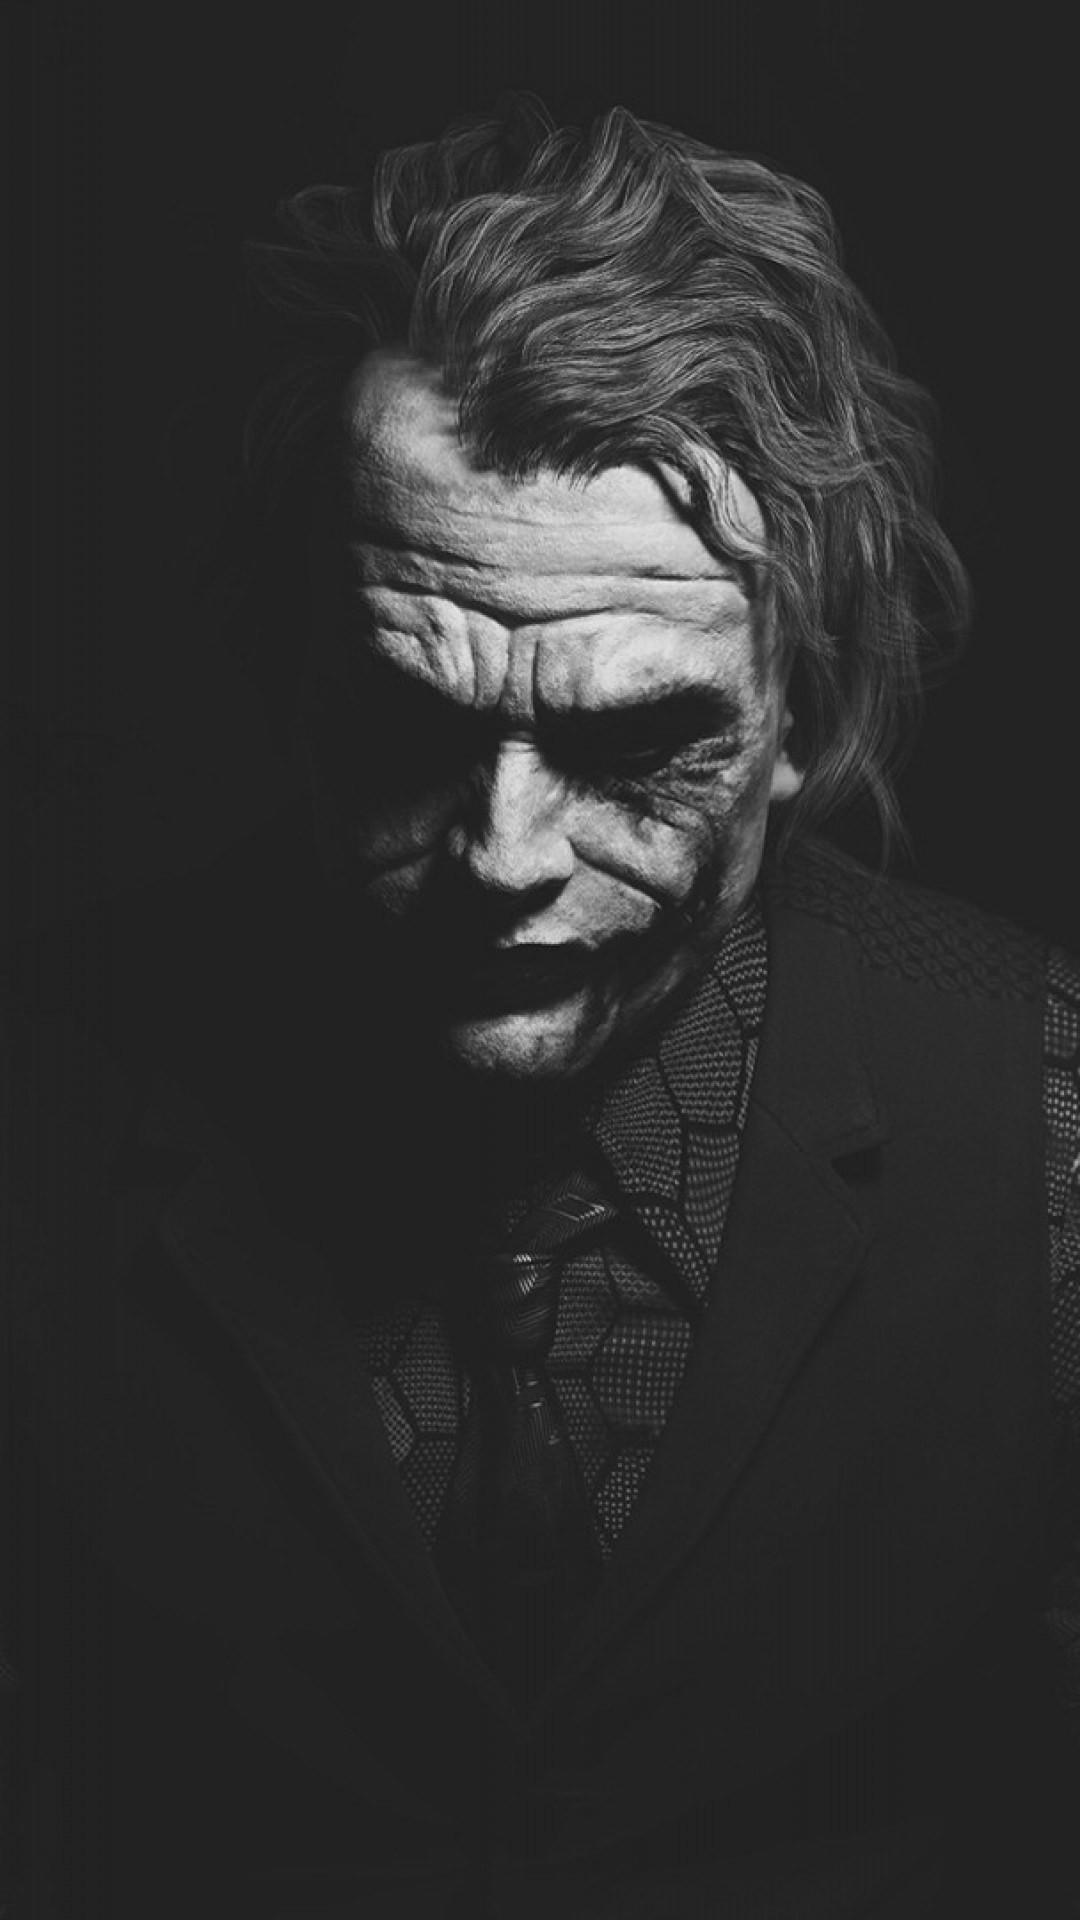 Heath Ledger Joker Monochrome Batman. Joker Hd Wallpapers For  Iphone